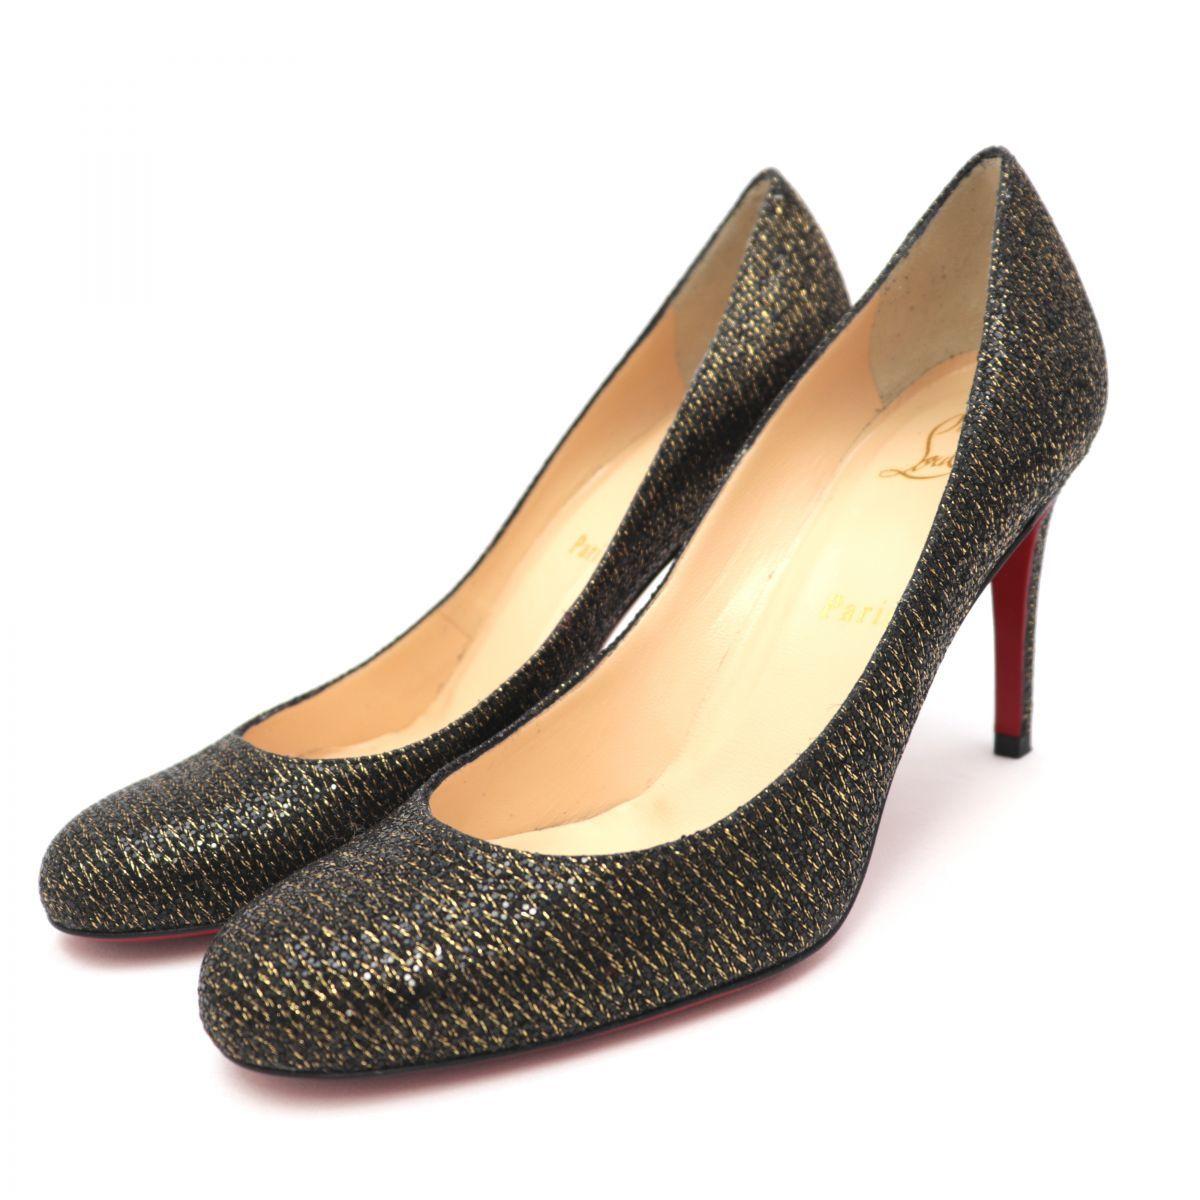 Christian Louboutin MISS GENA 85 LADY GLITTER Glitter Heel Pumps Women's Black 37